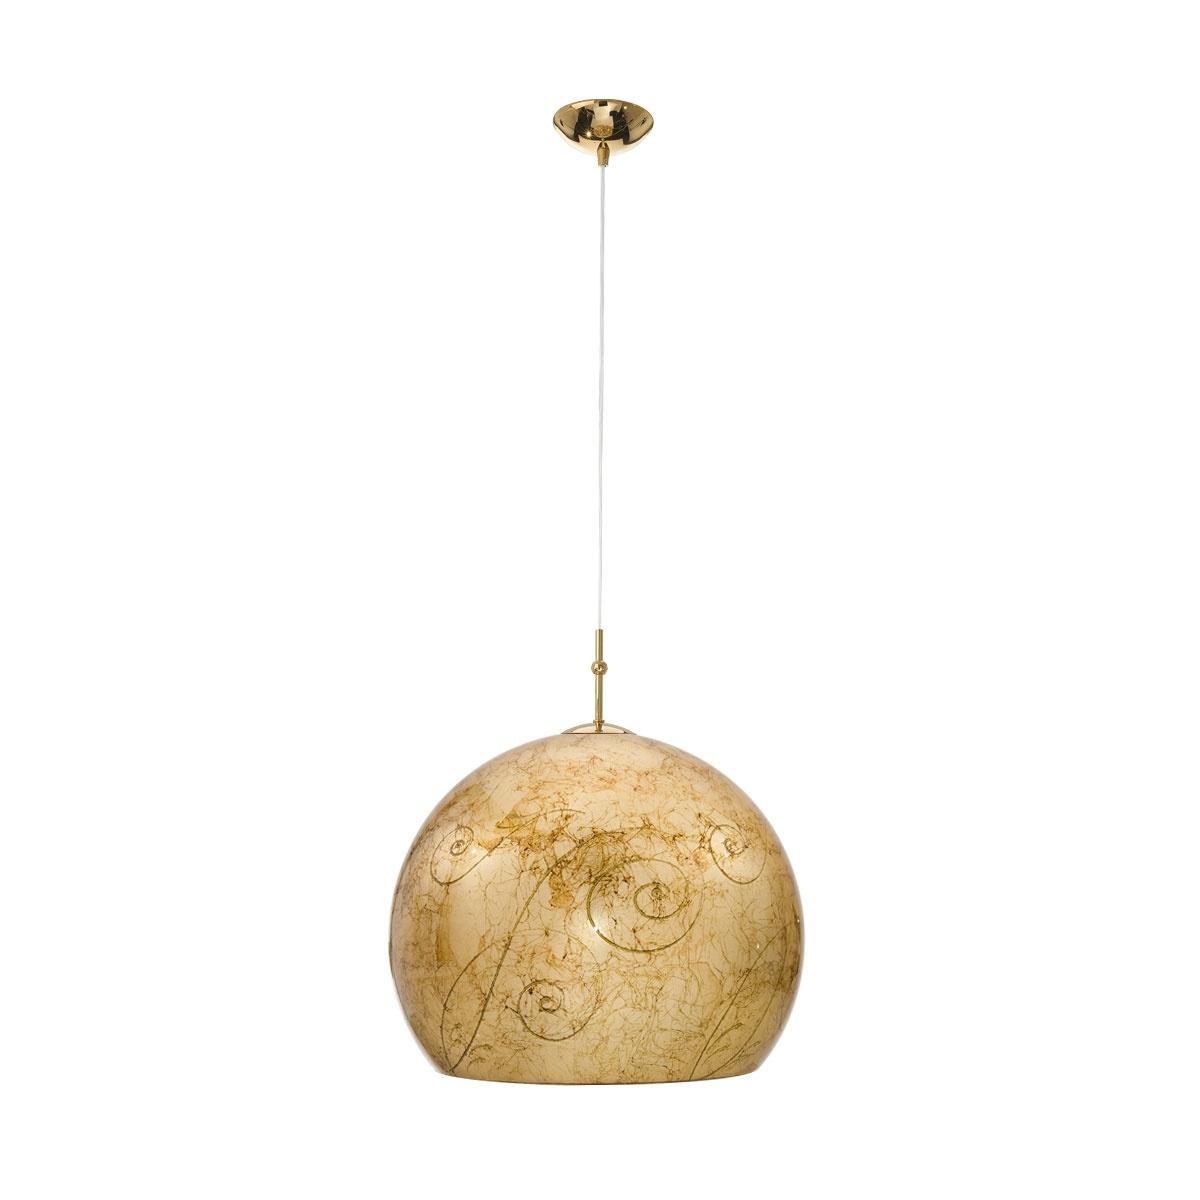 kolarz-pendelleuchte-luna-pl-gold-glas-metall-0392-31l-3-me-au